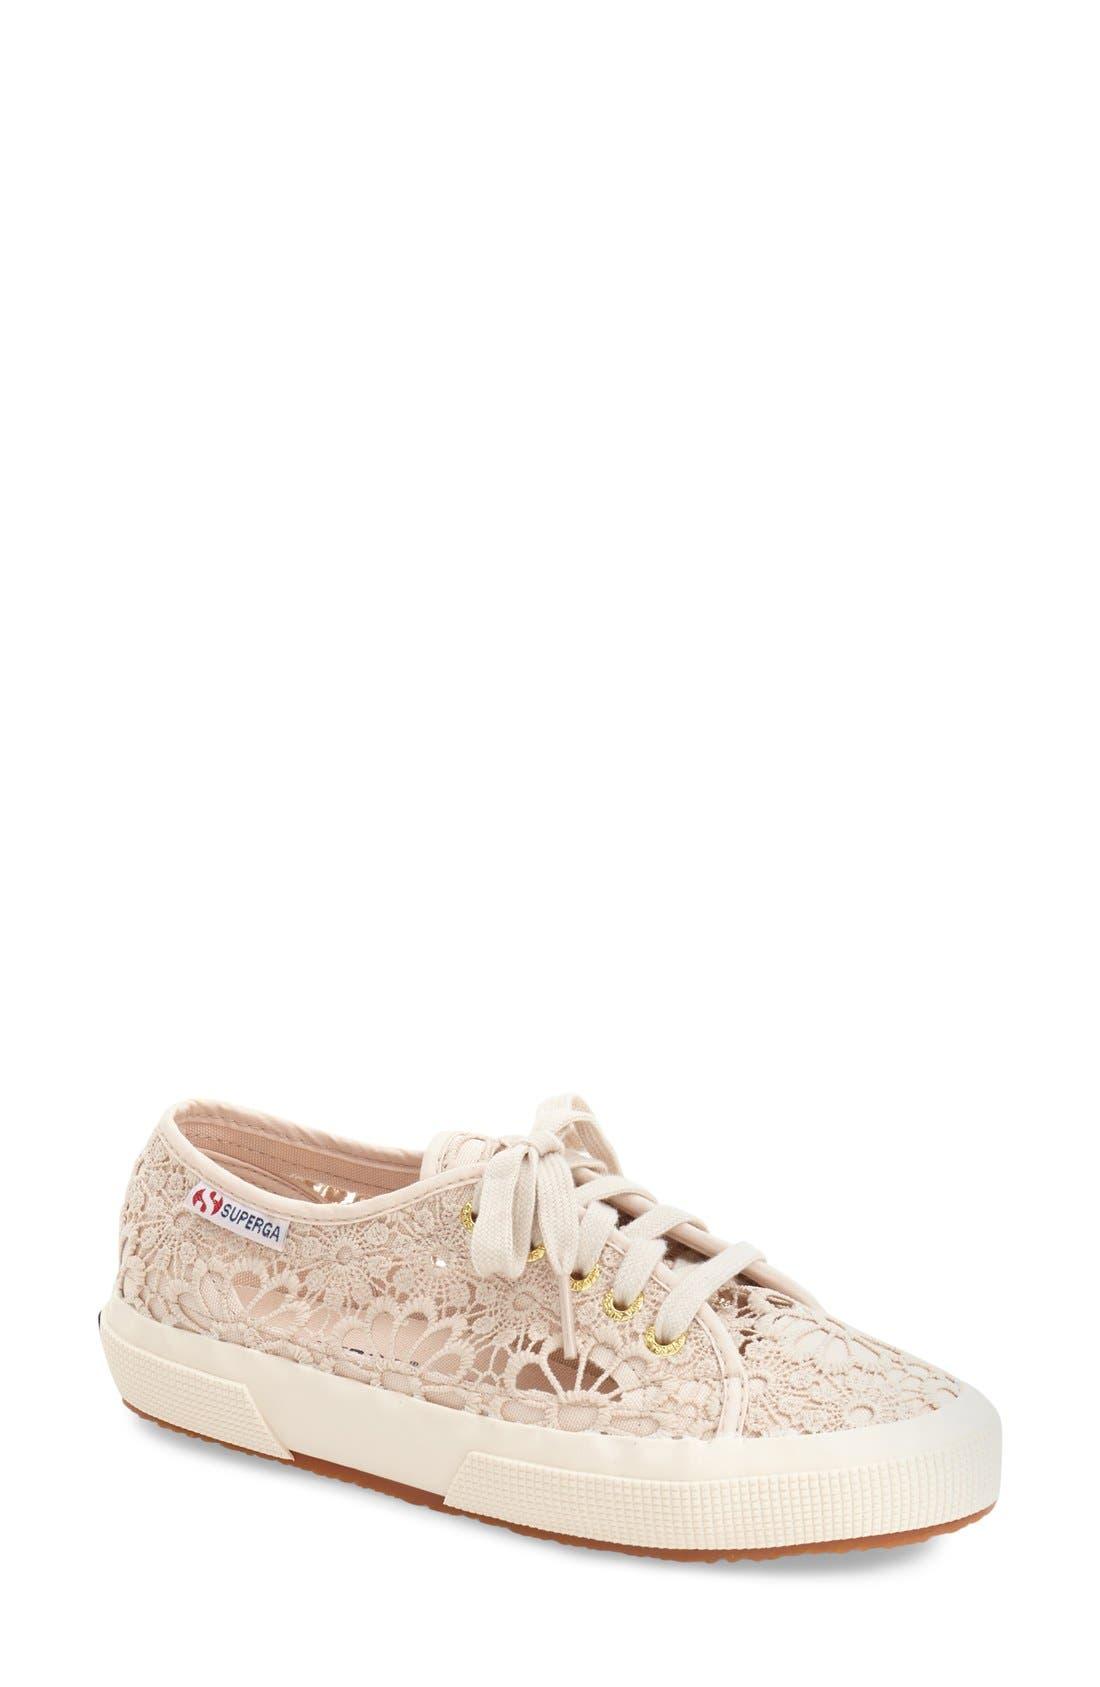 Superga 'Cot' Macramé Sneaker (Women)